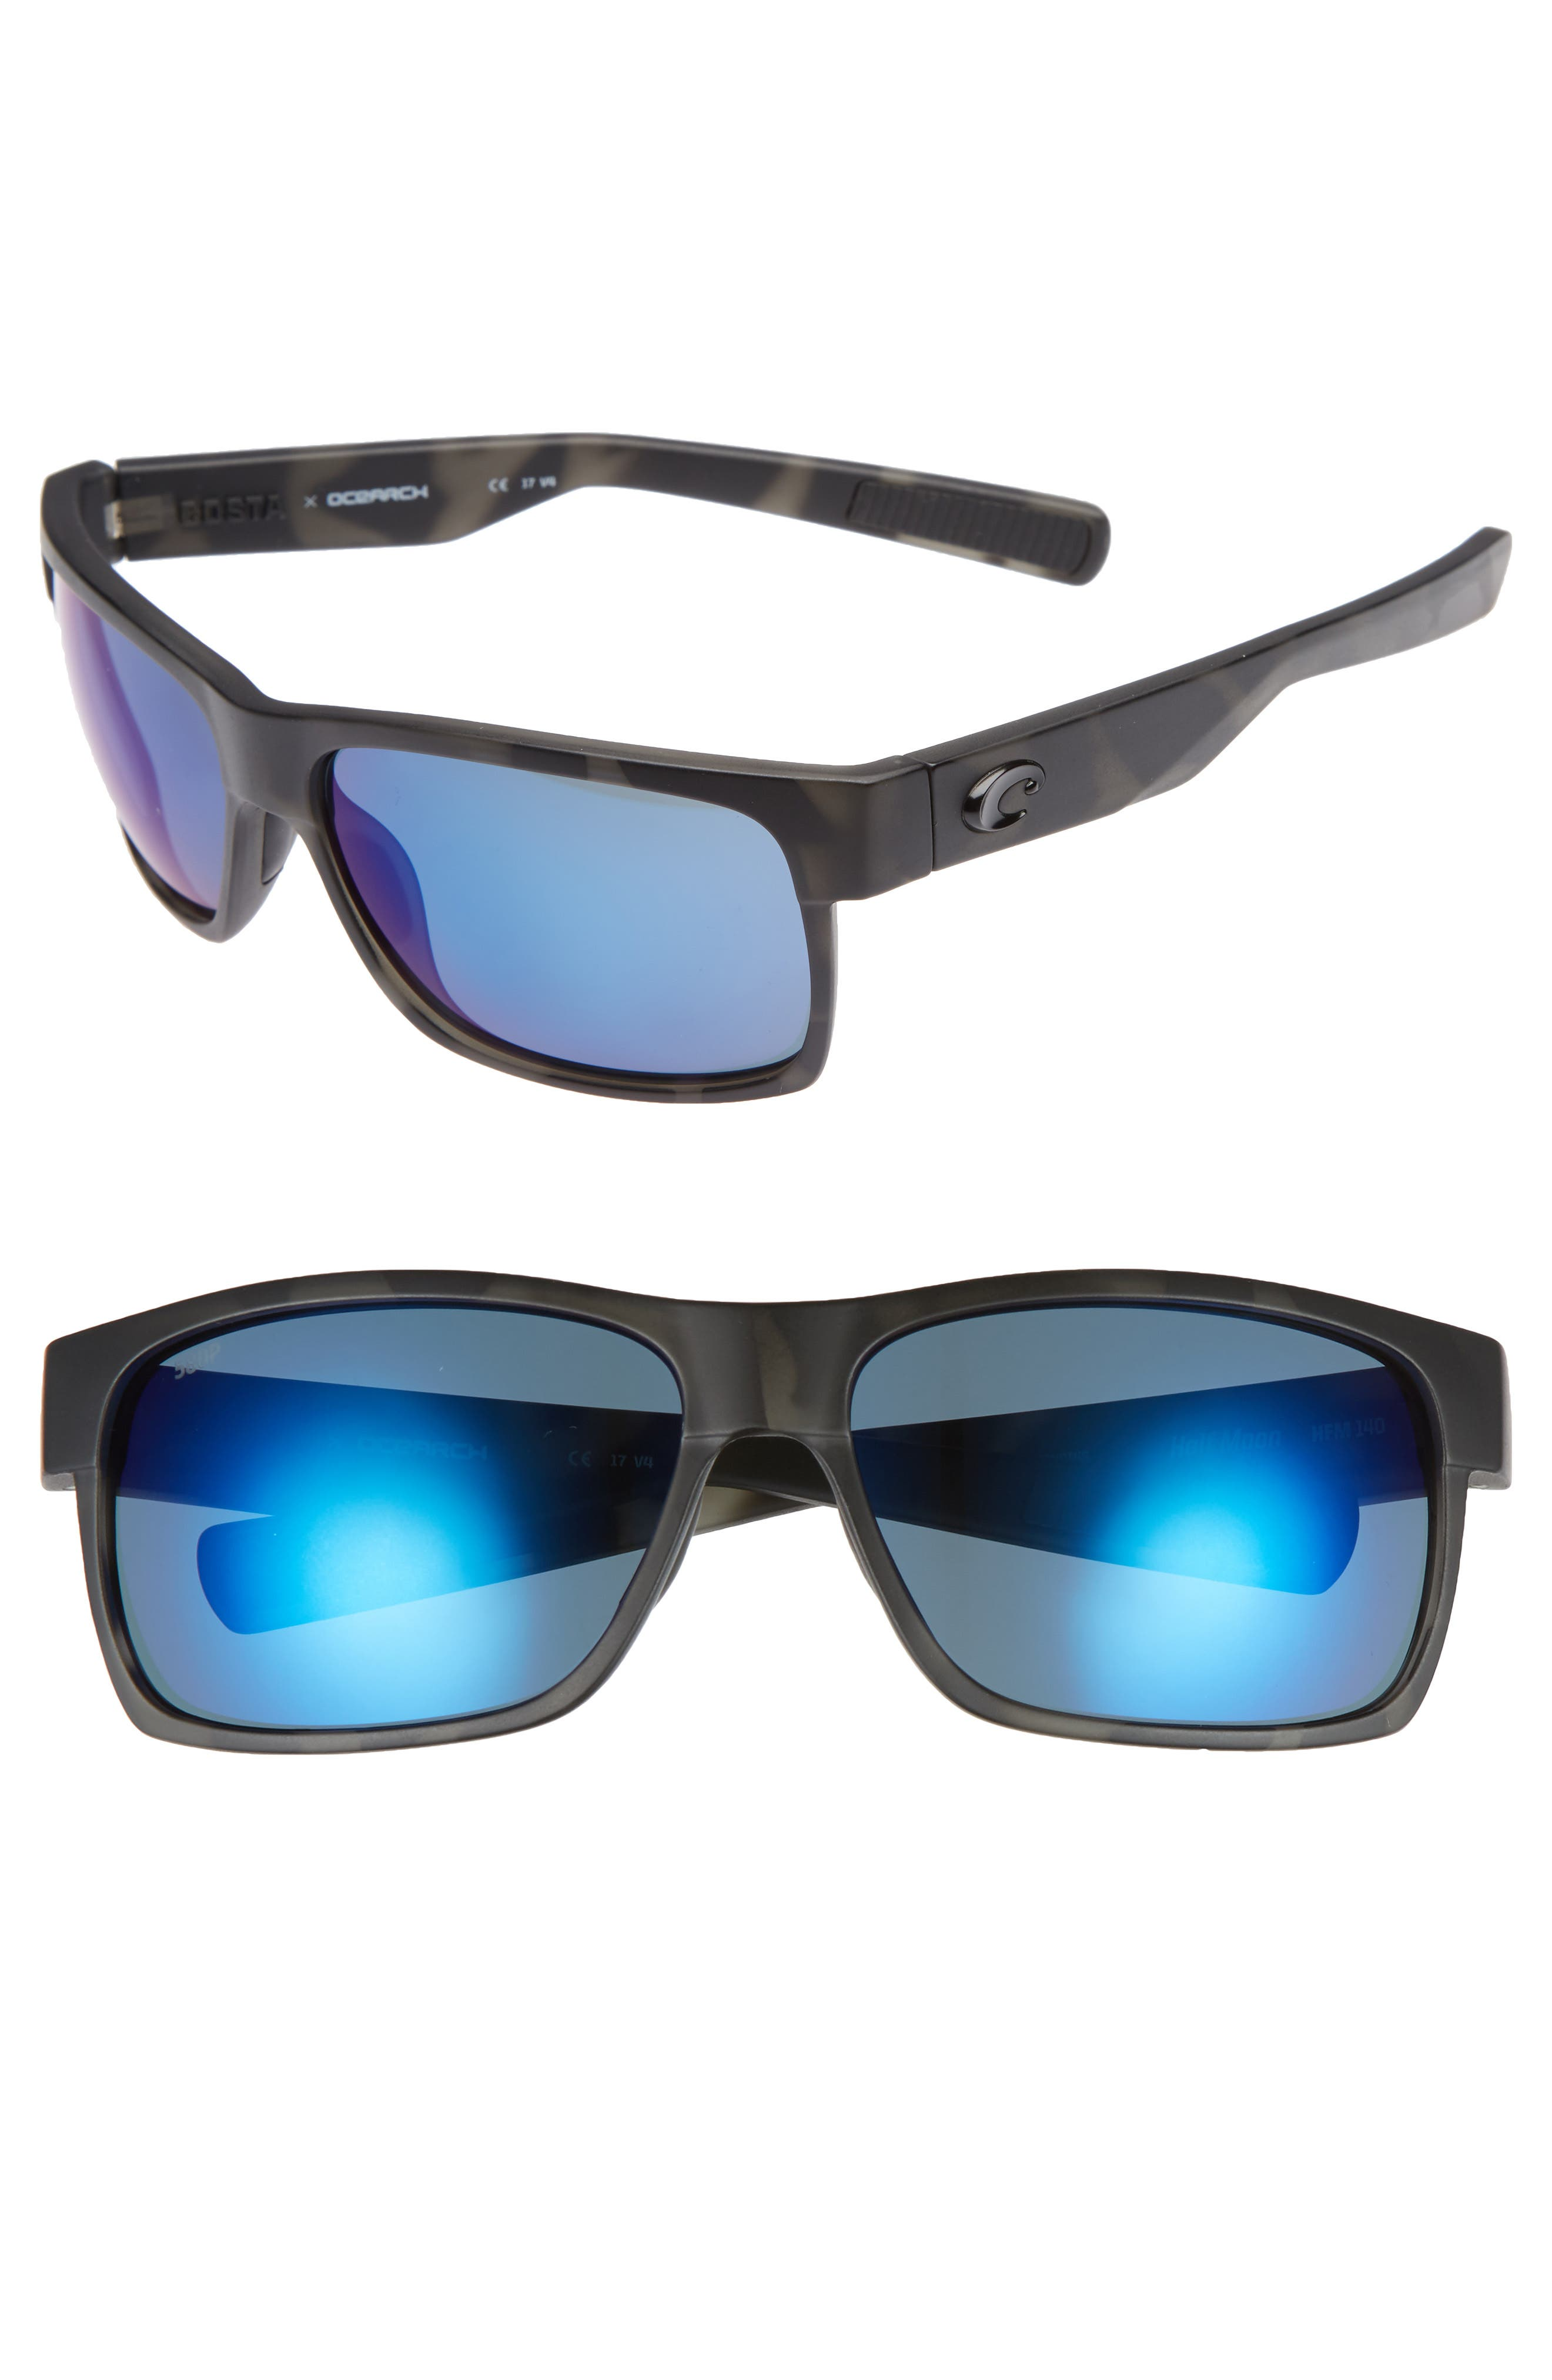 Half Moon 60mm Polarized Sunglasses,                         Main,                         color, Black Tortoise/ Silver Mirror